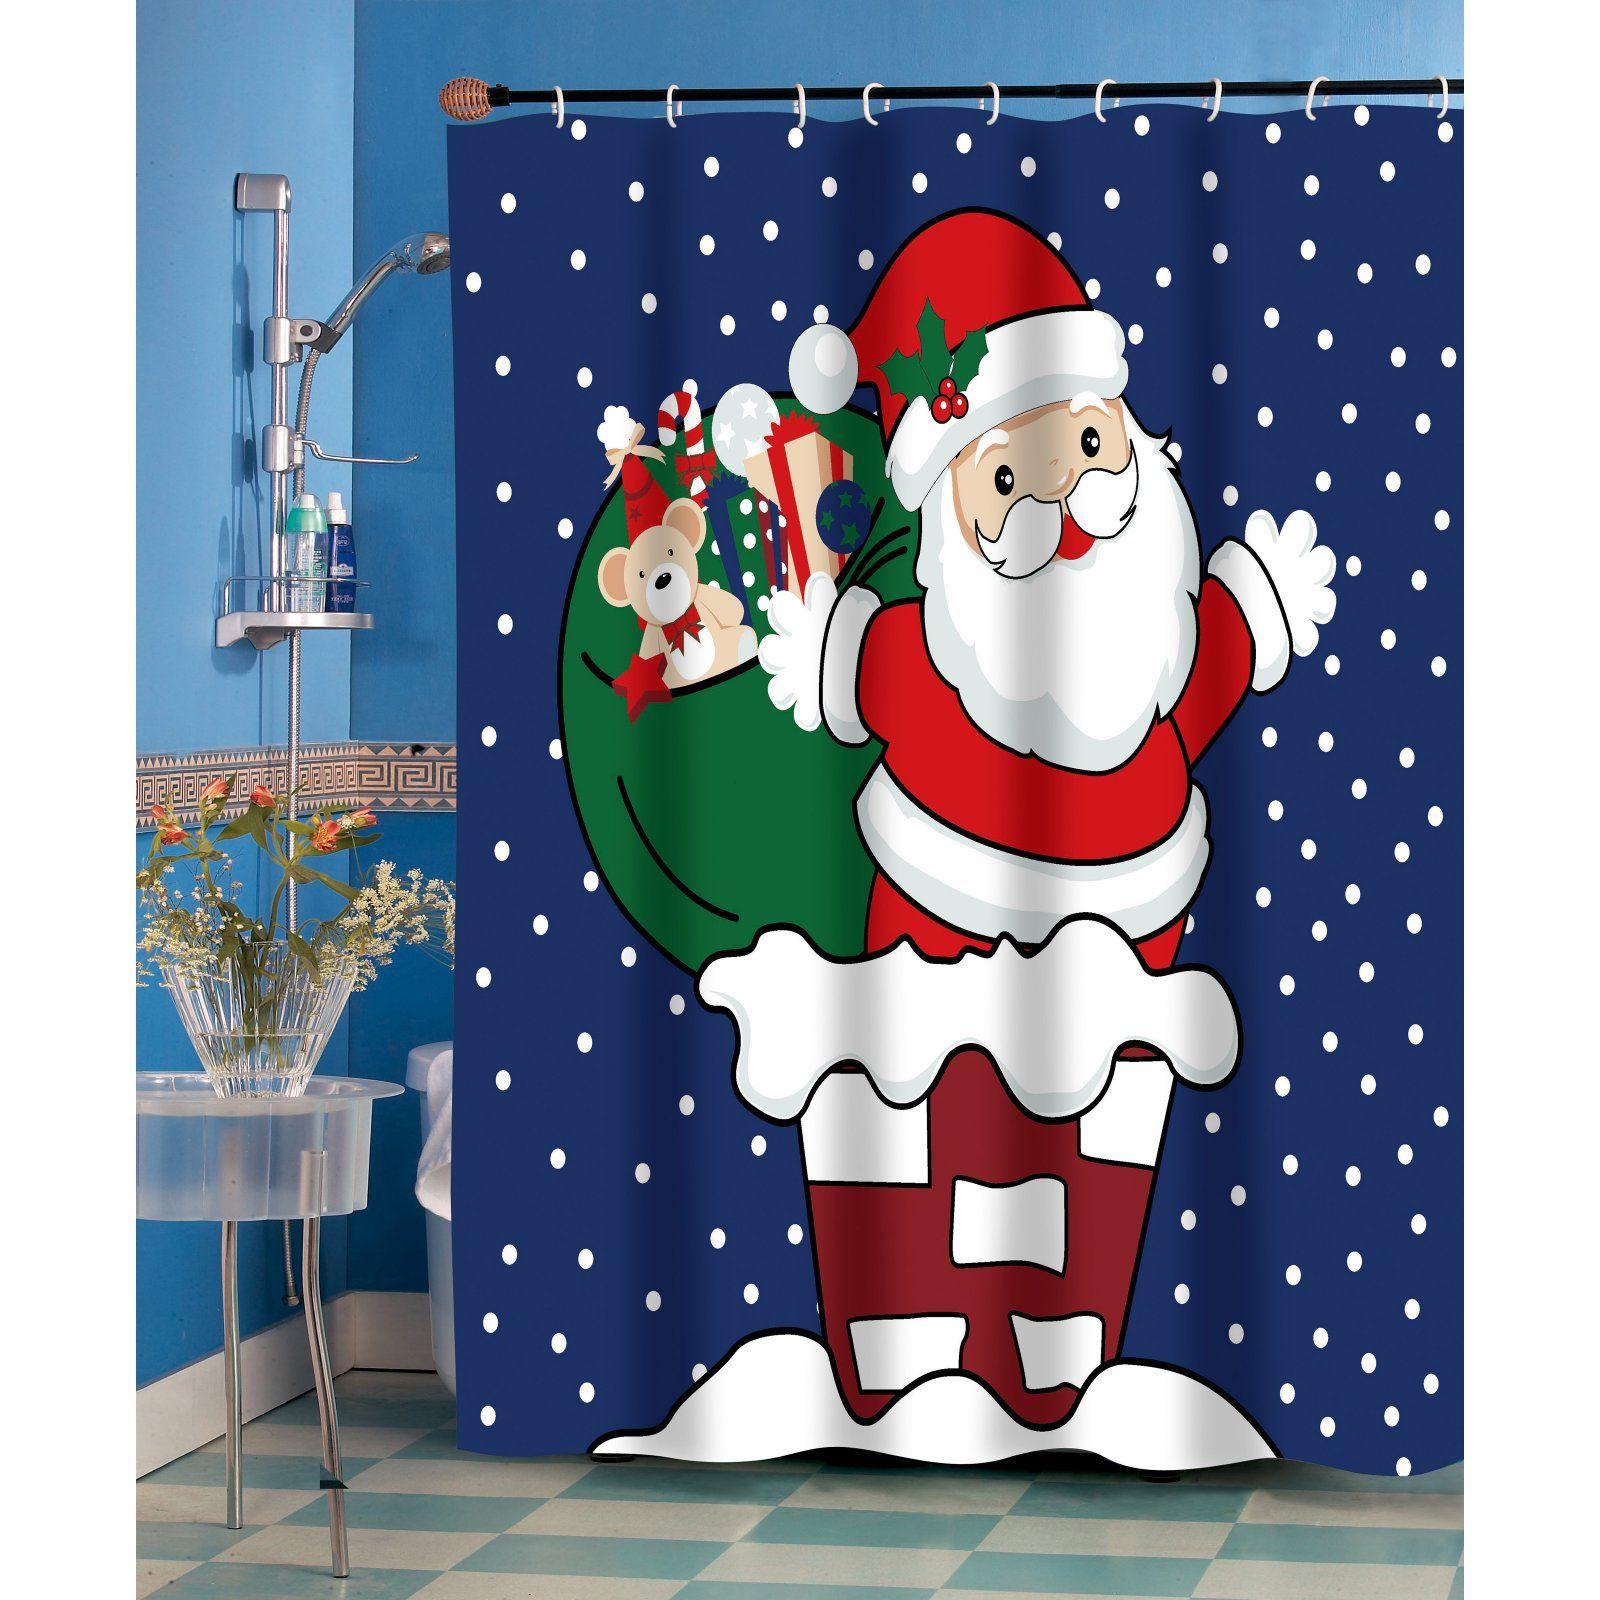 XMAS SANTA CLAUS FABRIC SHOWER CURTAIN Red Christmas bath